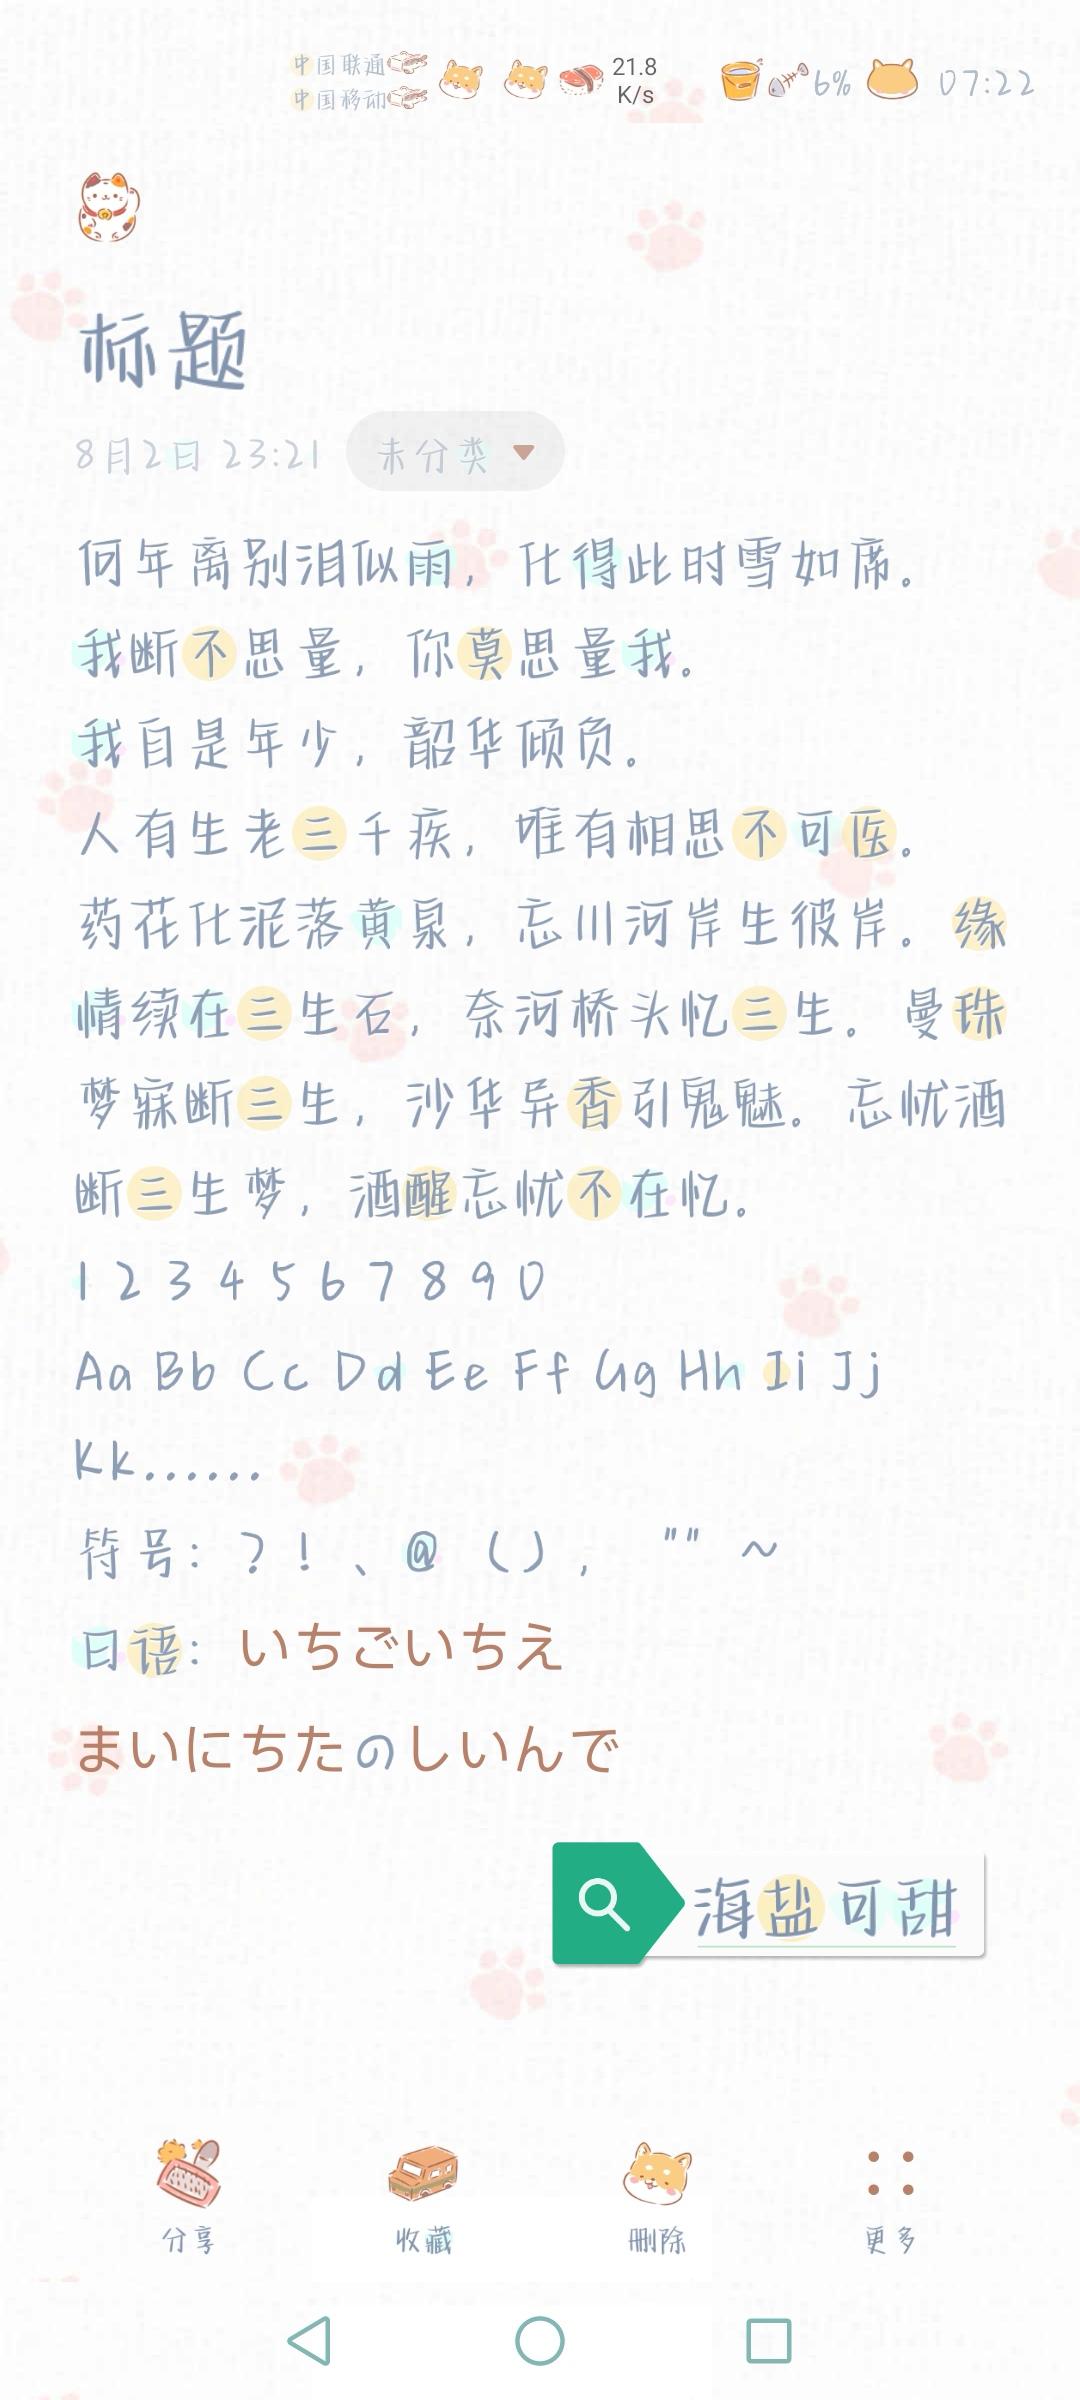 Screenshot_20210805_072247_com.huawei.notepad_edit_587307210861944.jpg